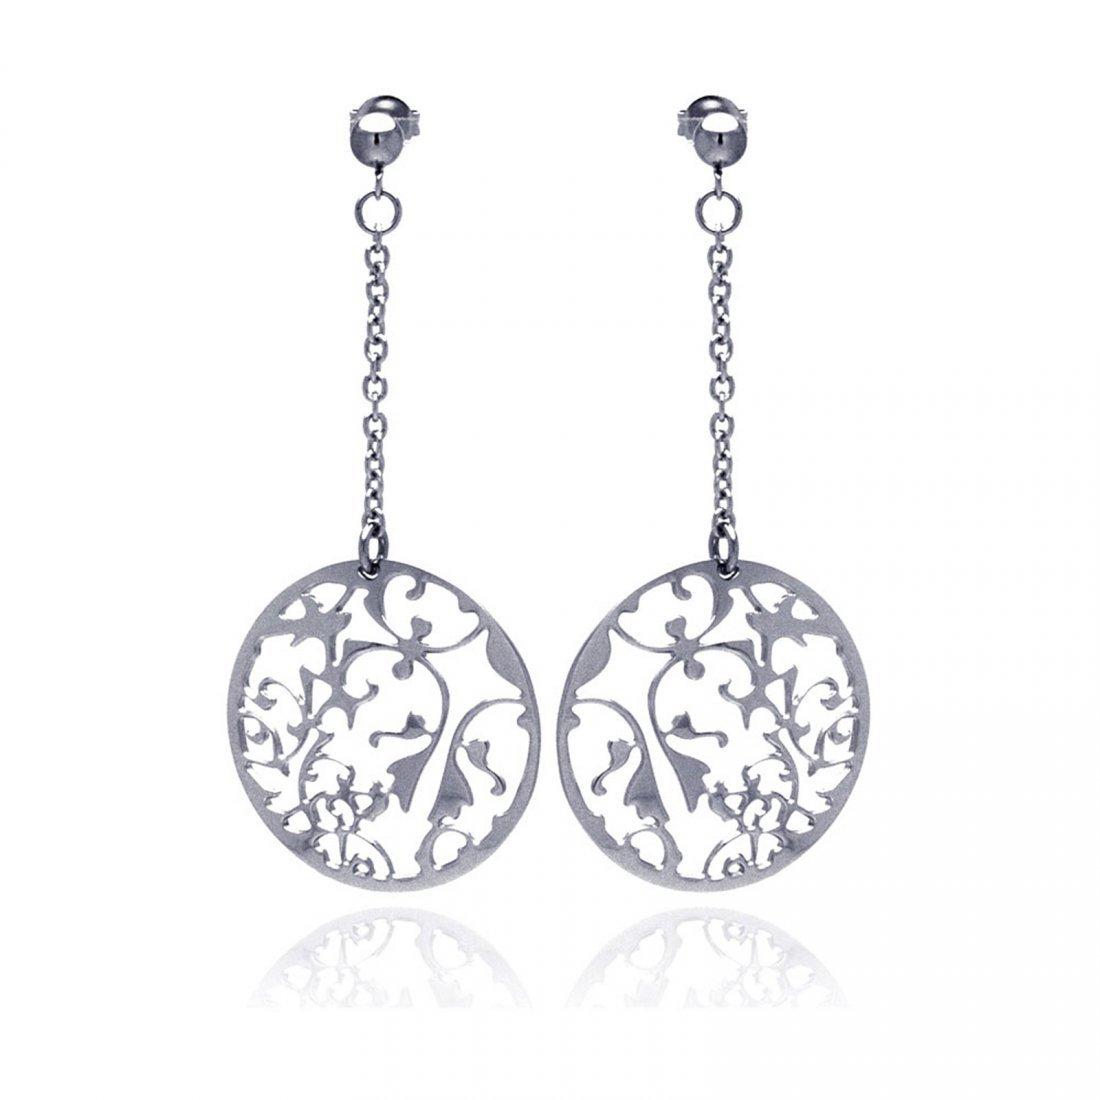 Stainless Steel Flower Design Disc Hanging Stud Earring